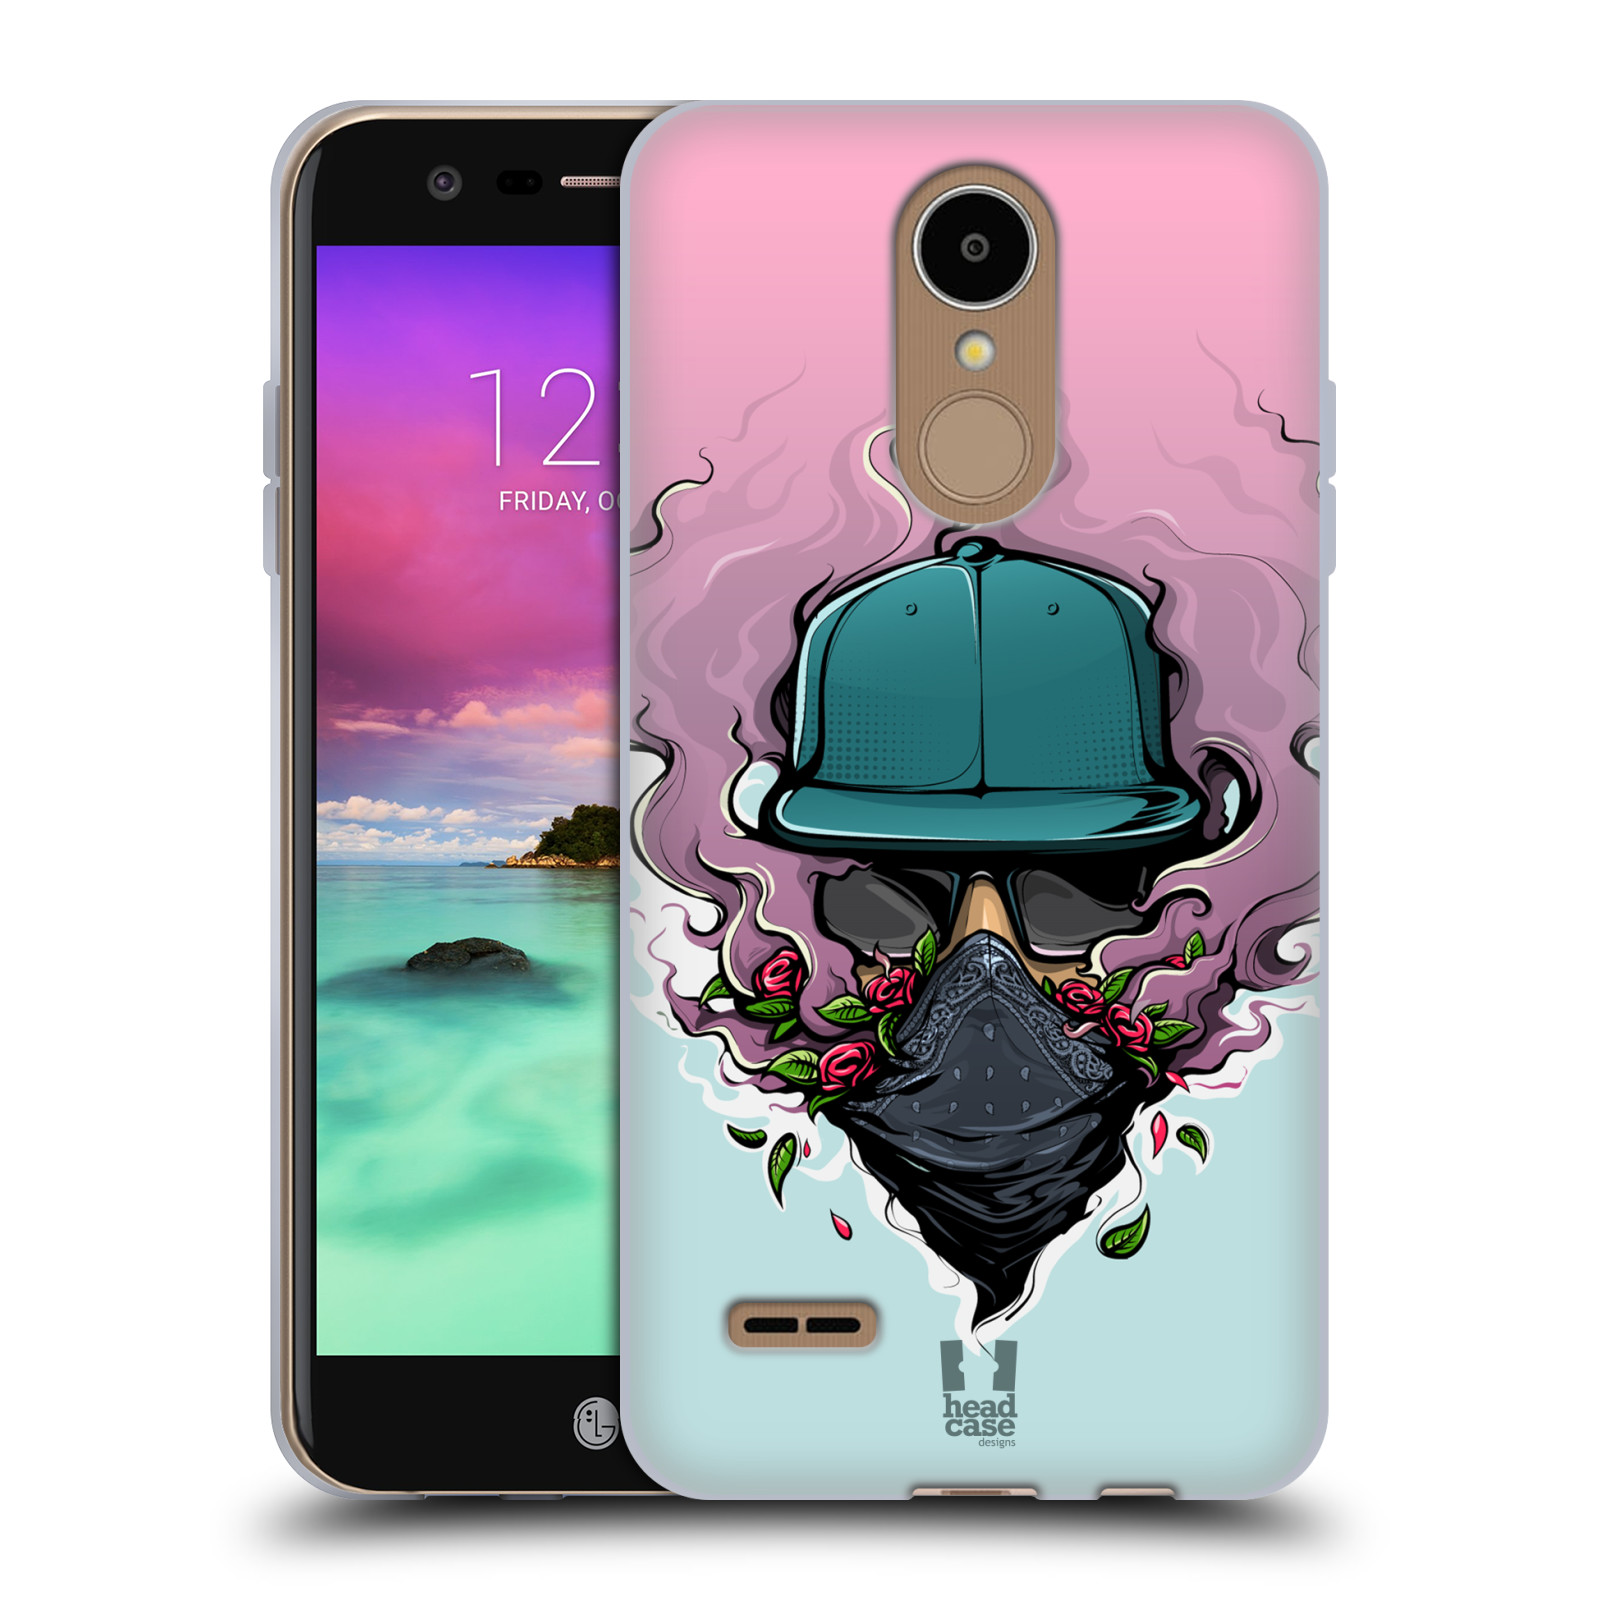 Case Designs URBAN VIBES Suave HEAD Gel caso para LG K8 (2017)